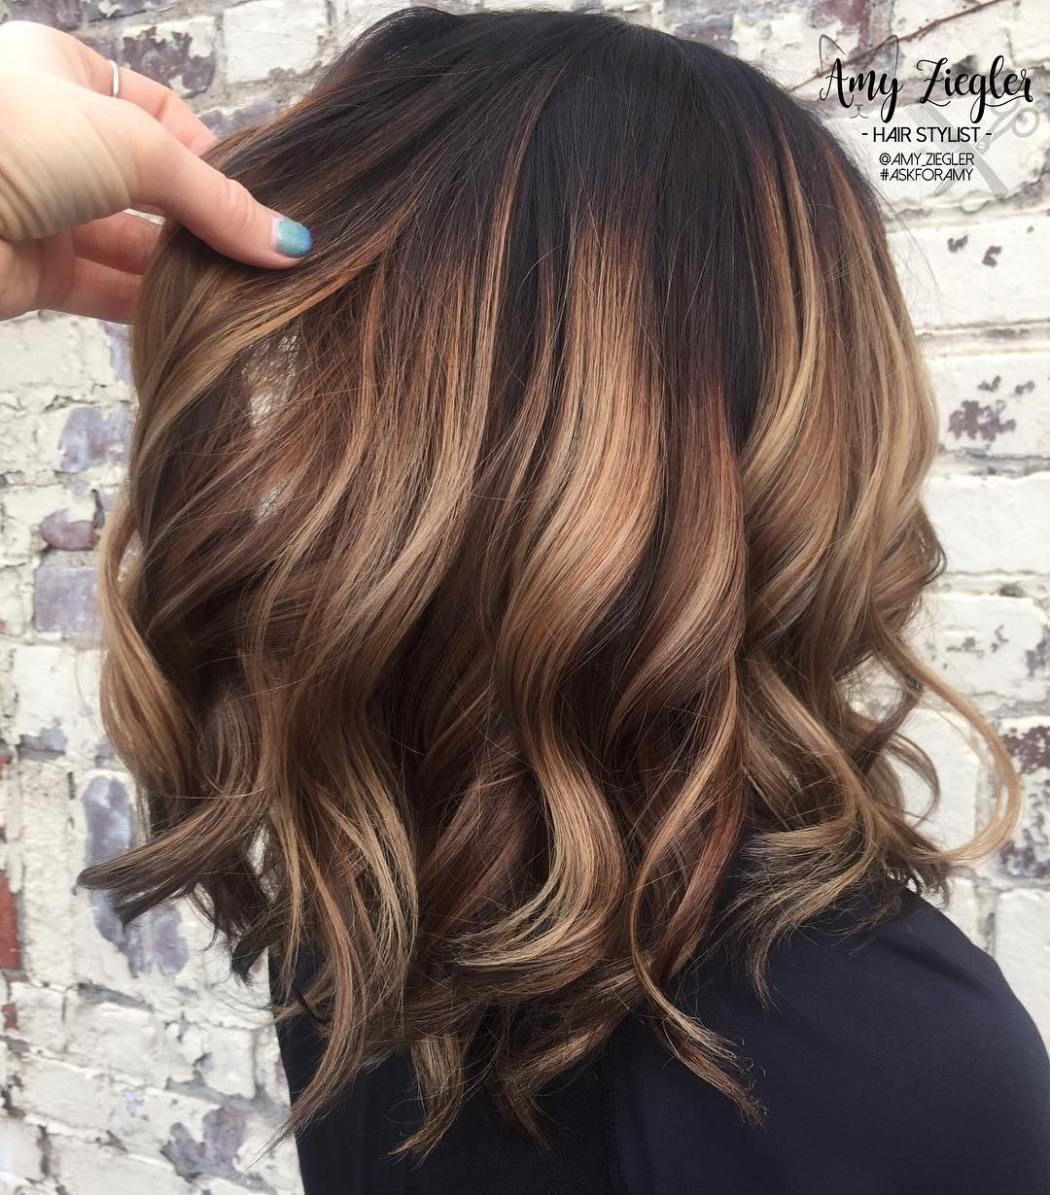 70 Flattering Balayage Hair Color Ideas For 2020 Fryzury Kolory